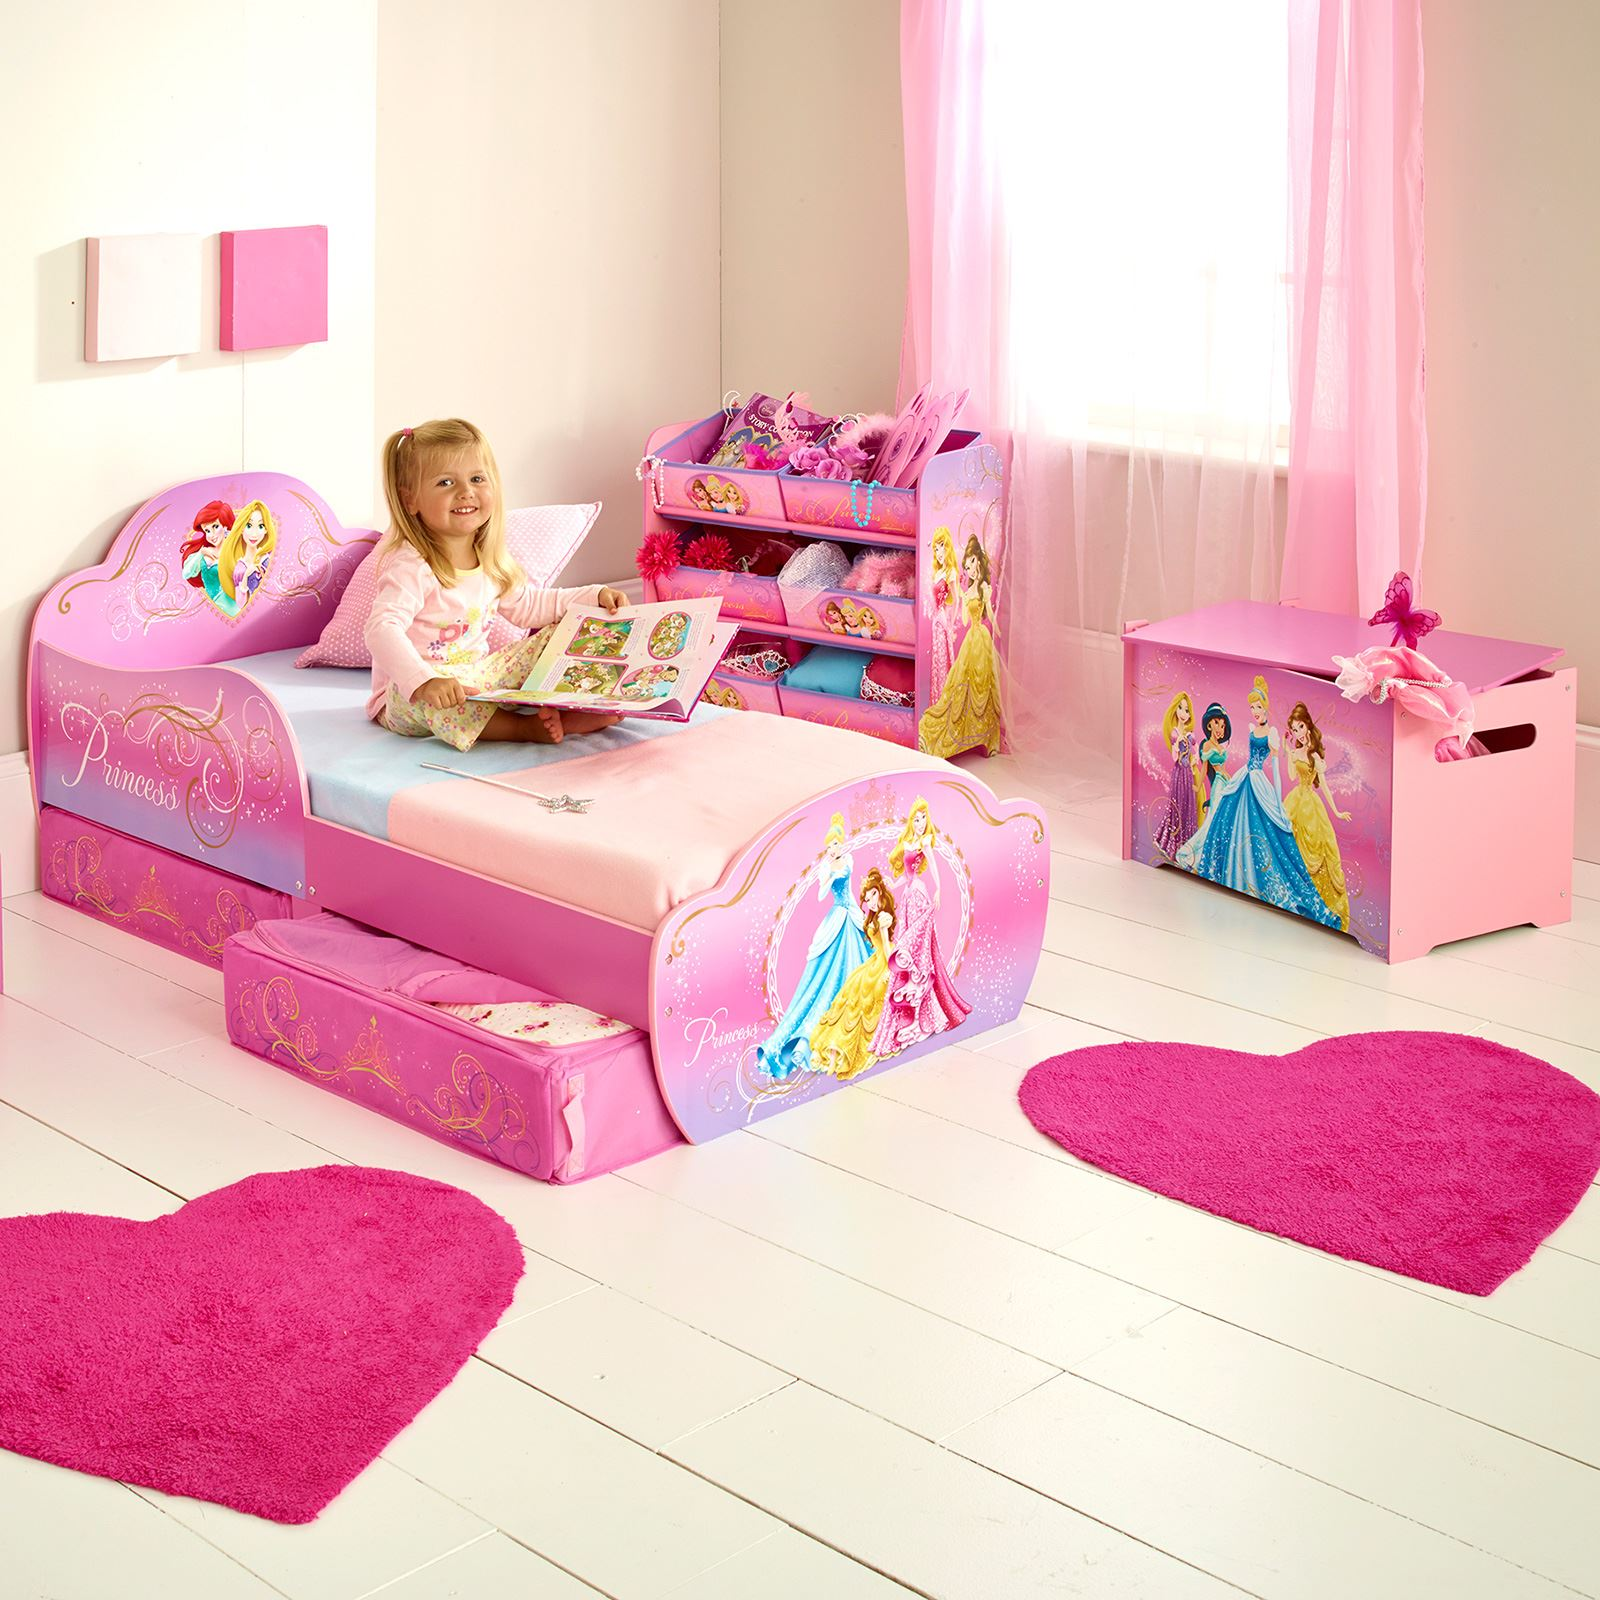 disney princess toddler junior bed with underbed storage mattress options ebay. Black Bedroom Furniture Sets. Home Design Ideas